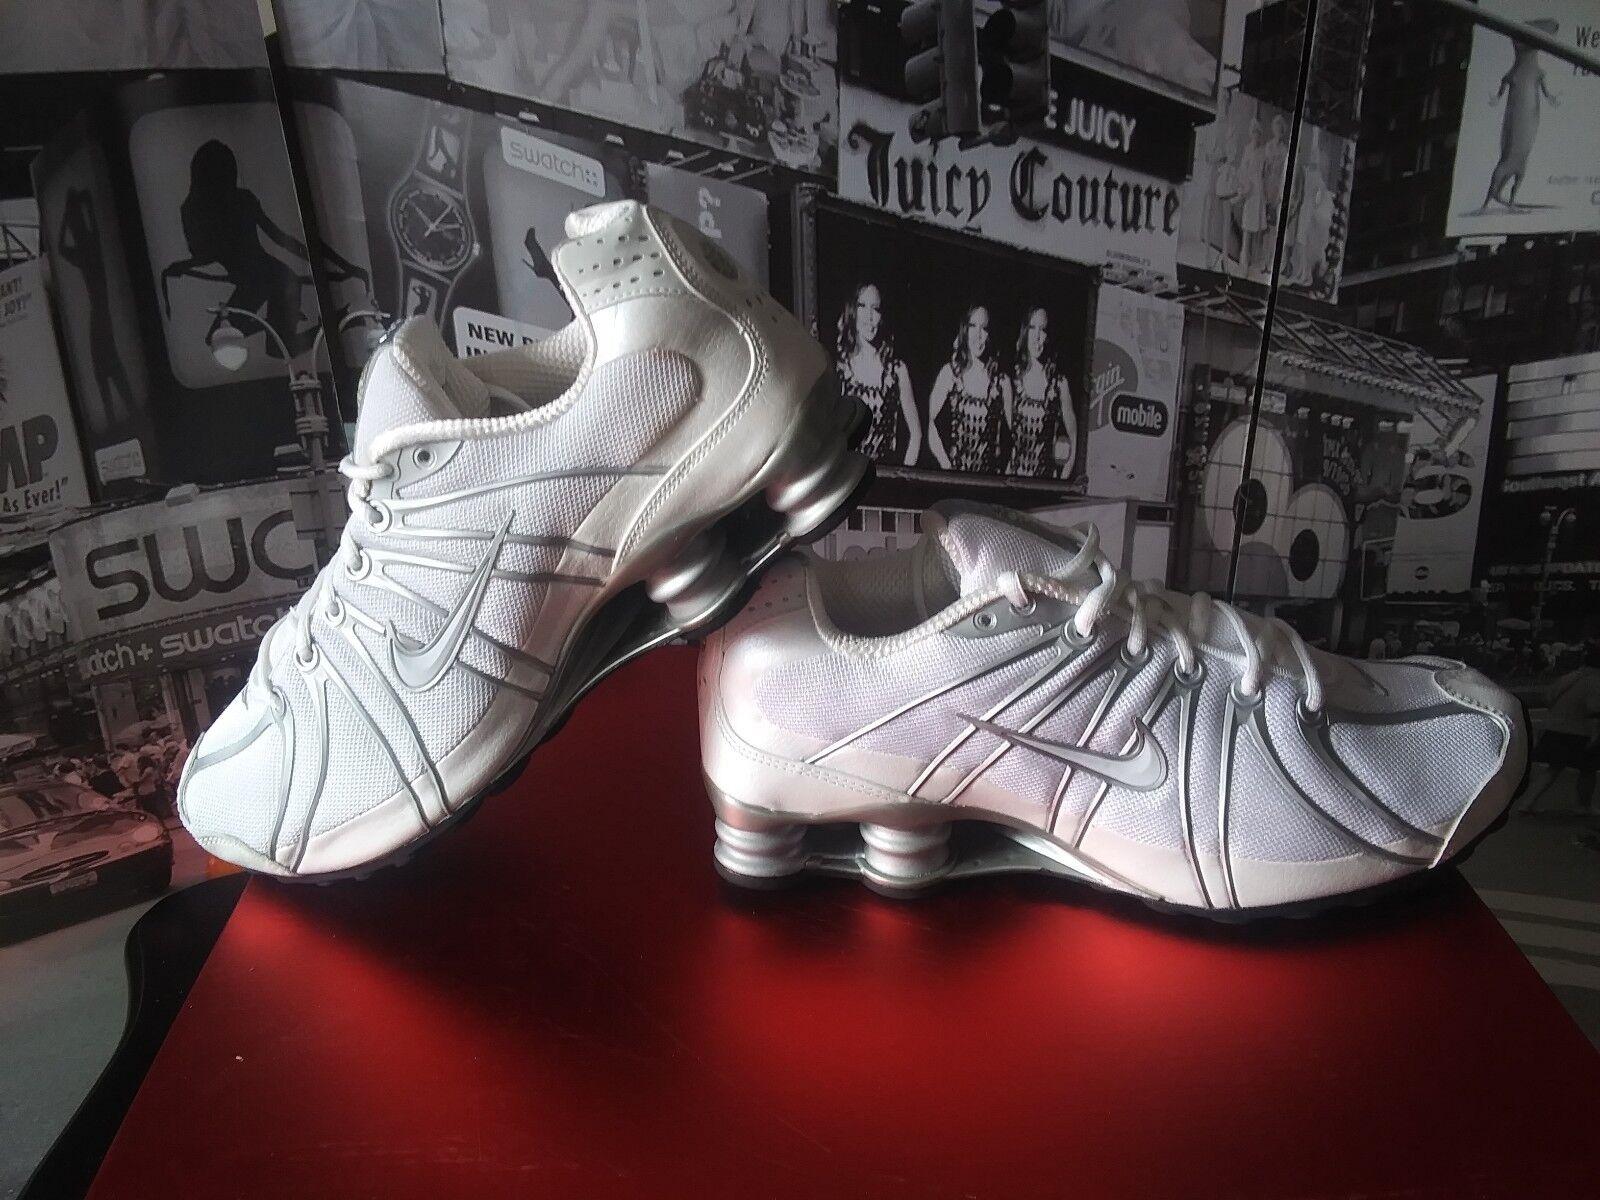 2008 MEN'S Nike Shox Turbo OZ MESH White  Silver shoes Size 9.5 NEW